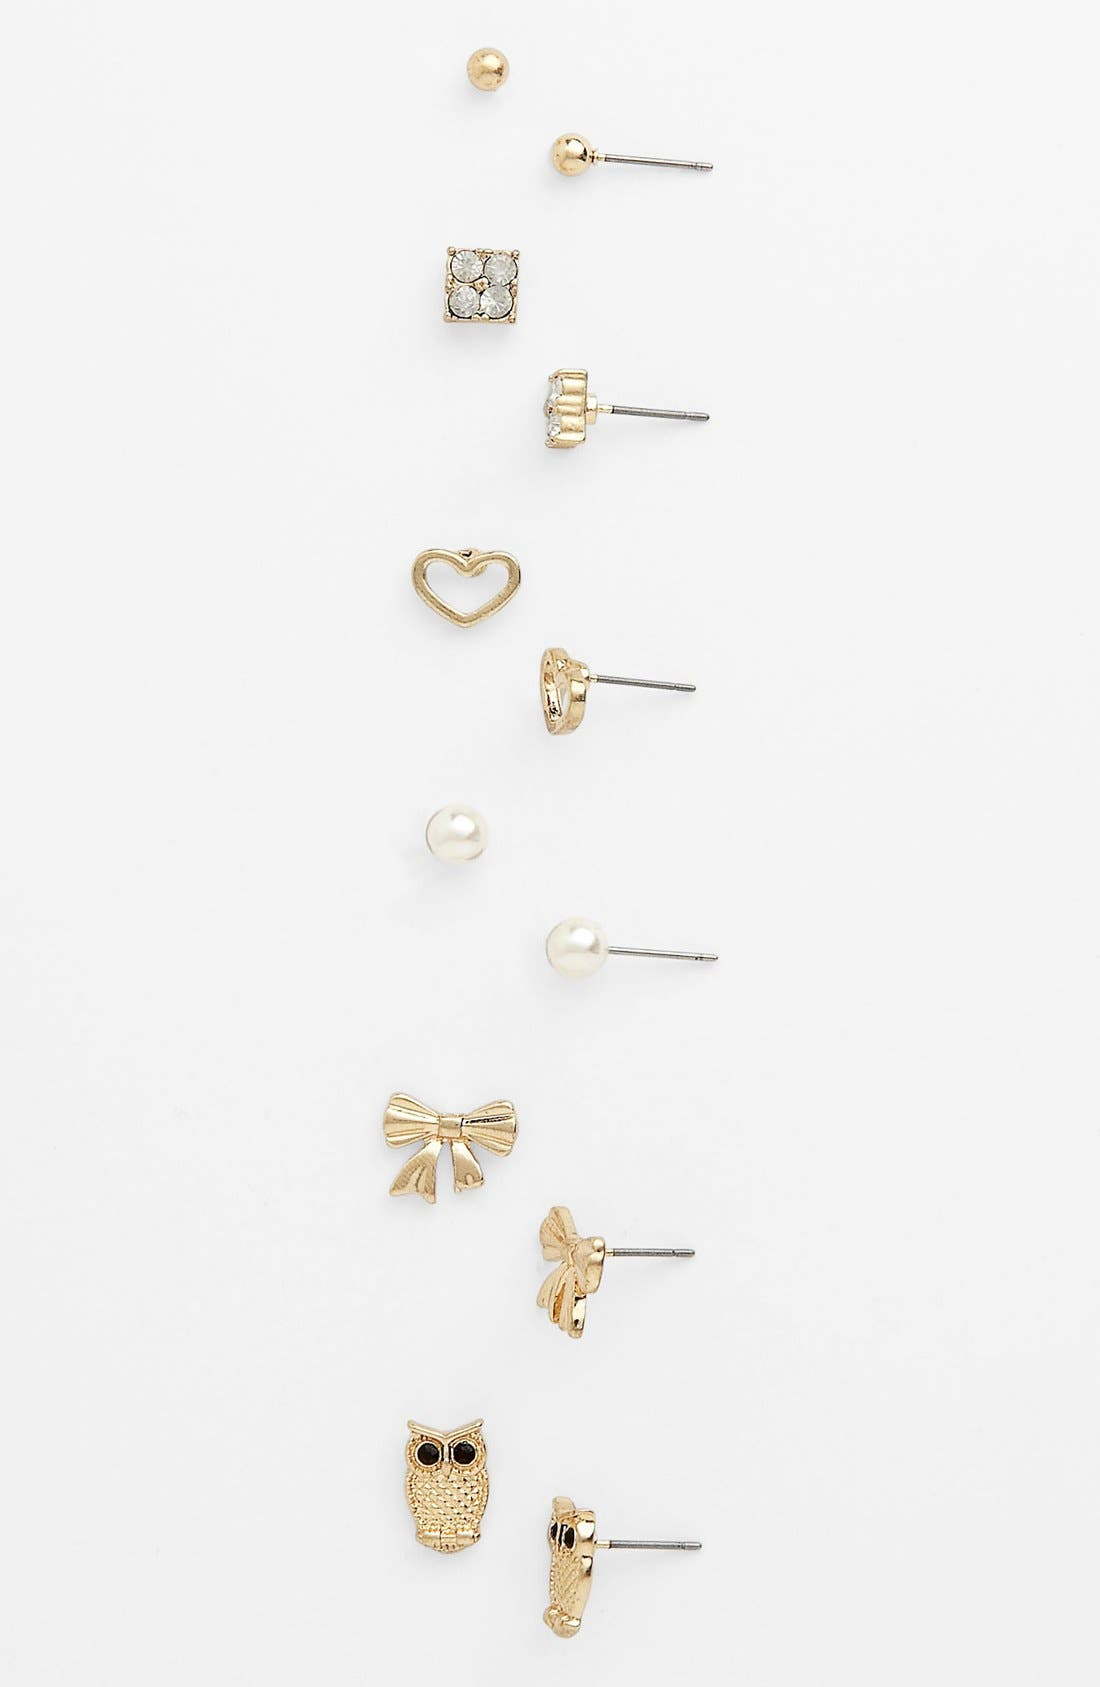 Main Image - Carole Stud Earrings (Set of 6)